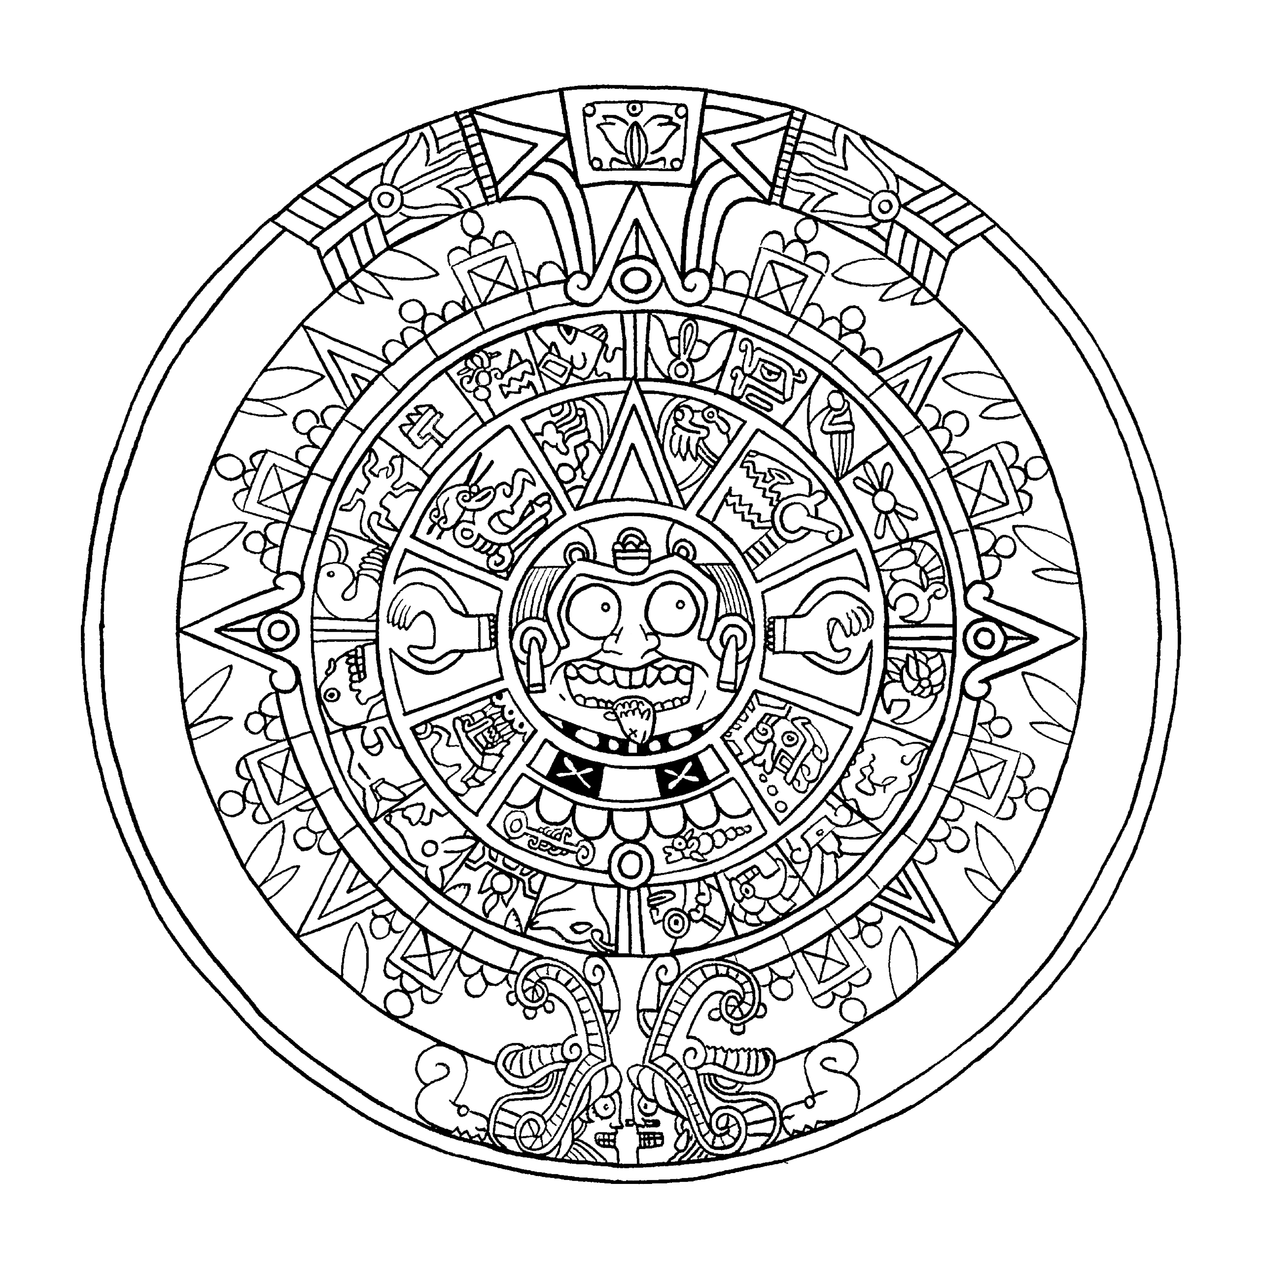 MayanCalendar how to draw mayan calendar page 2 Coloring